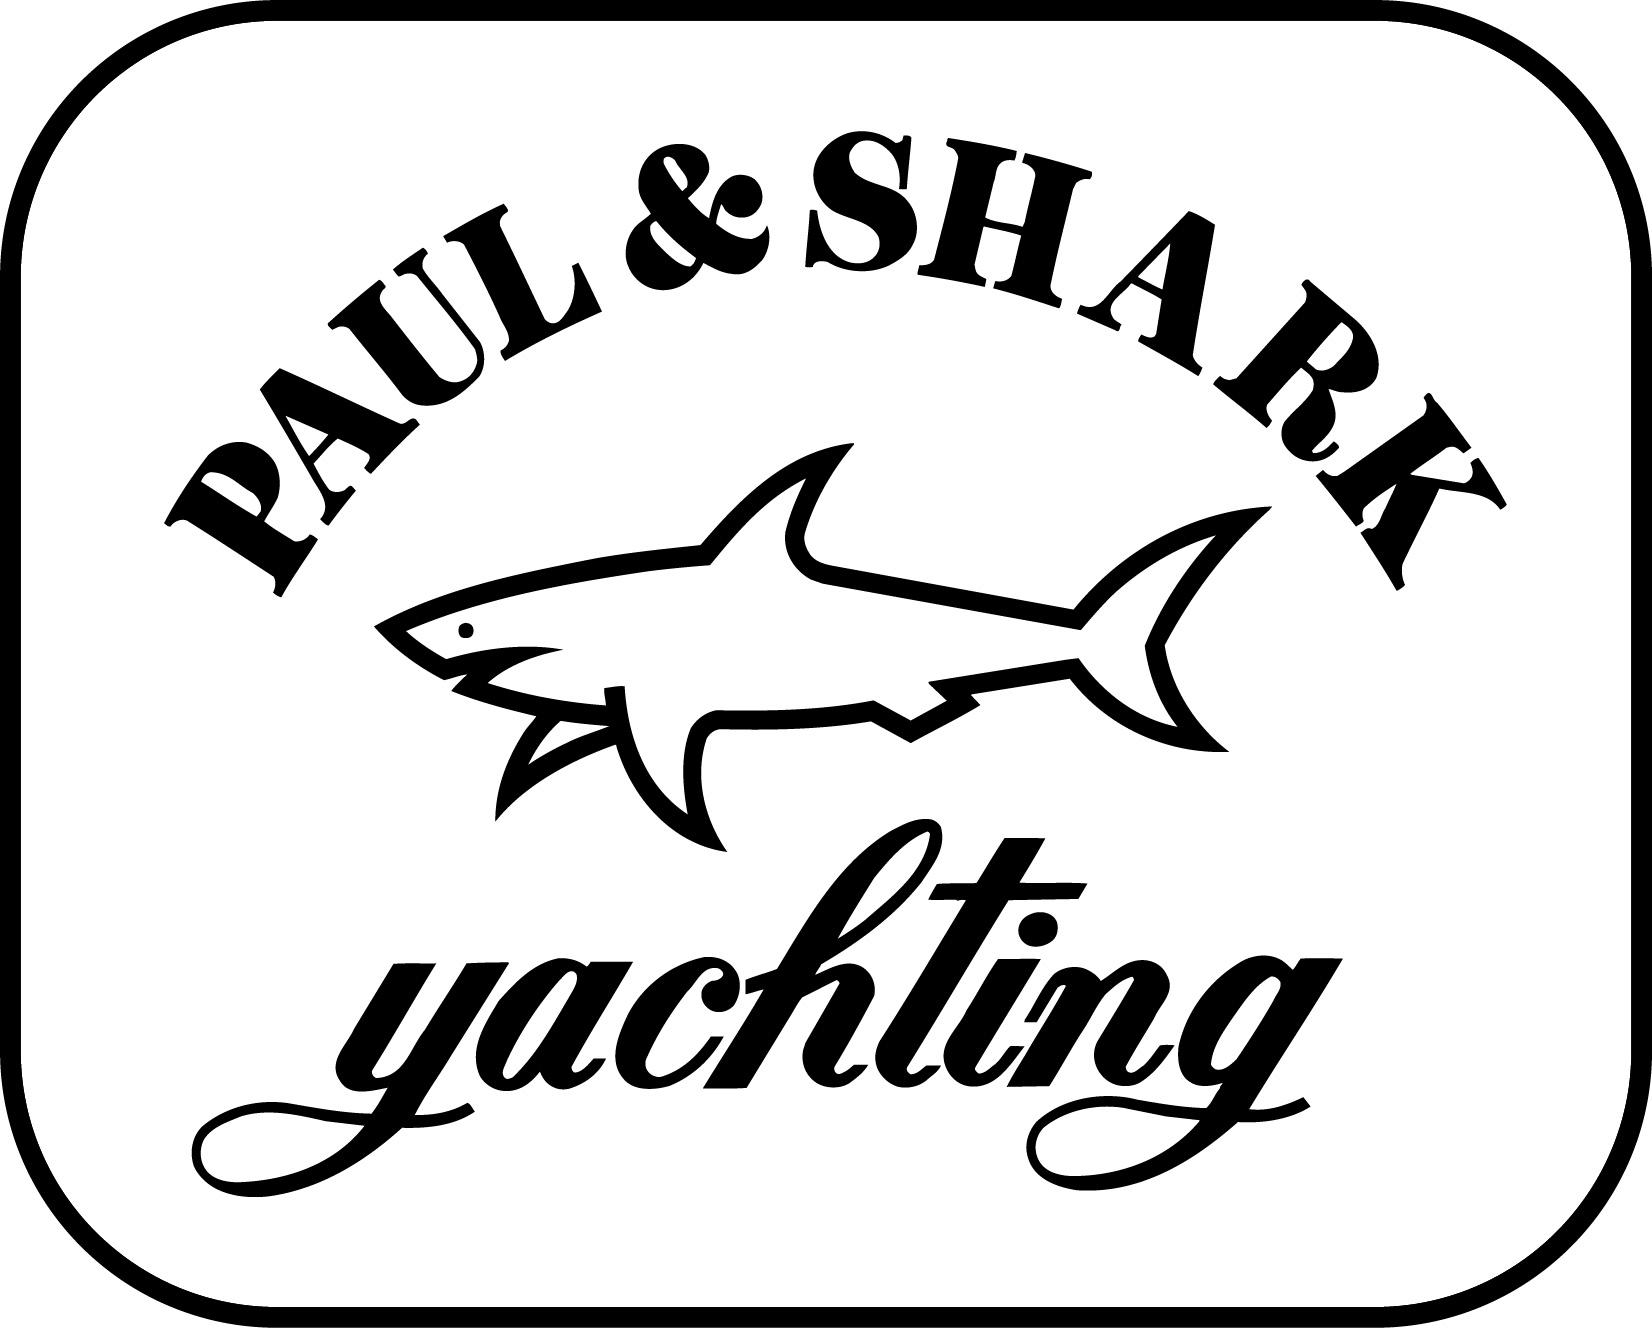 Paul & Shark Moncton Menswear Colpitts.jpg